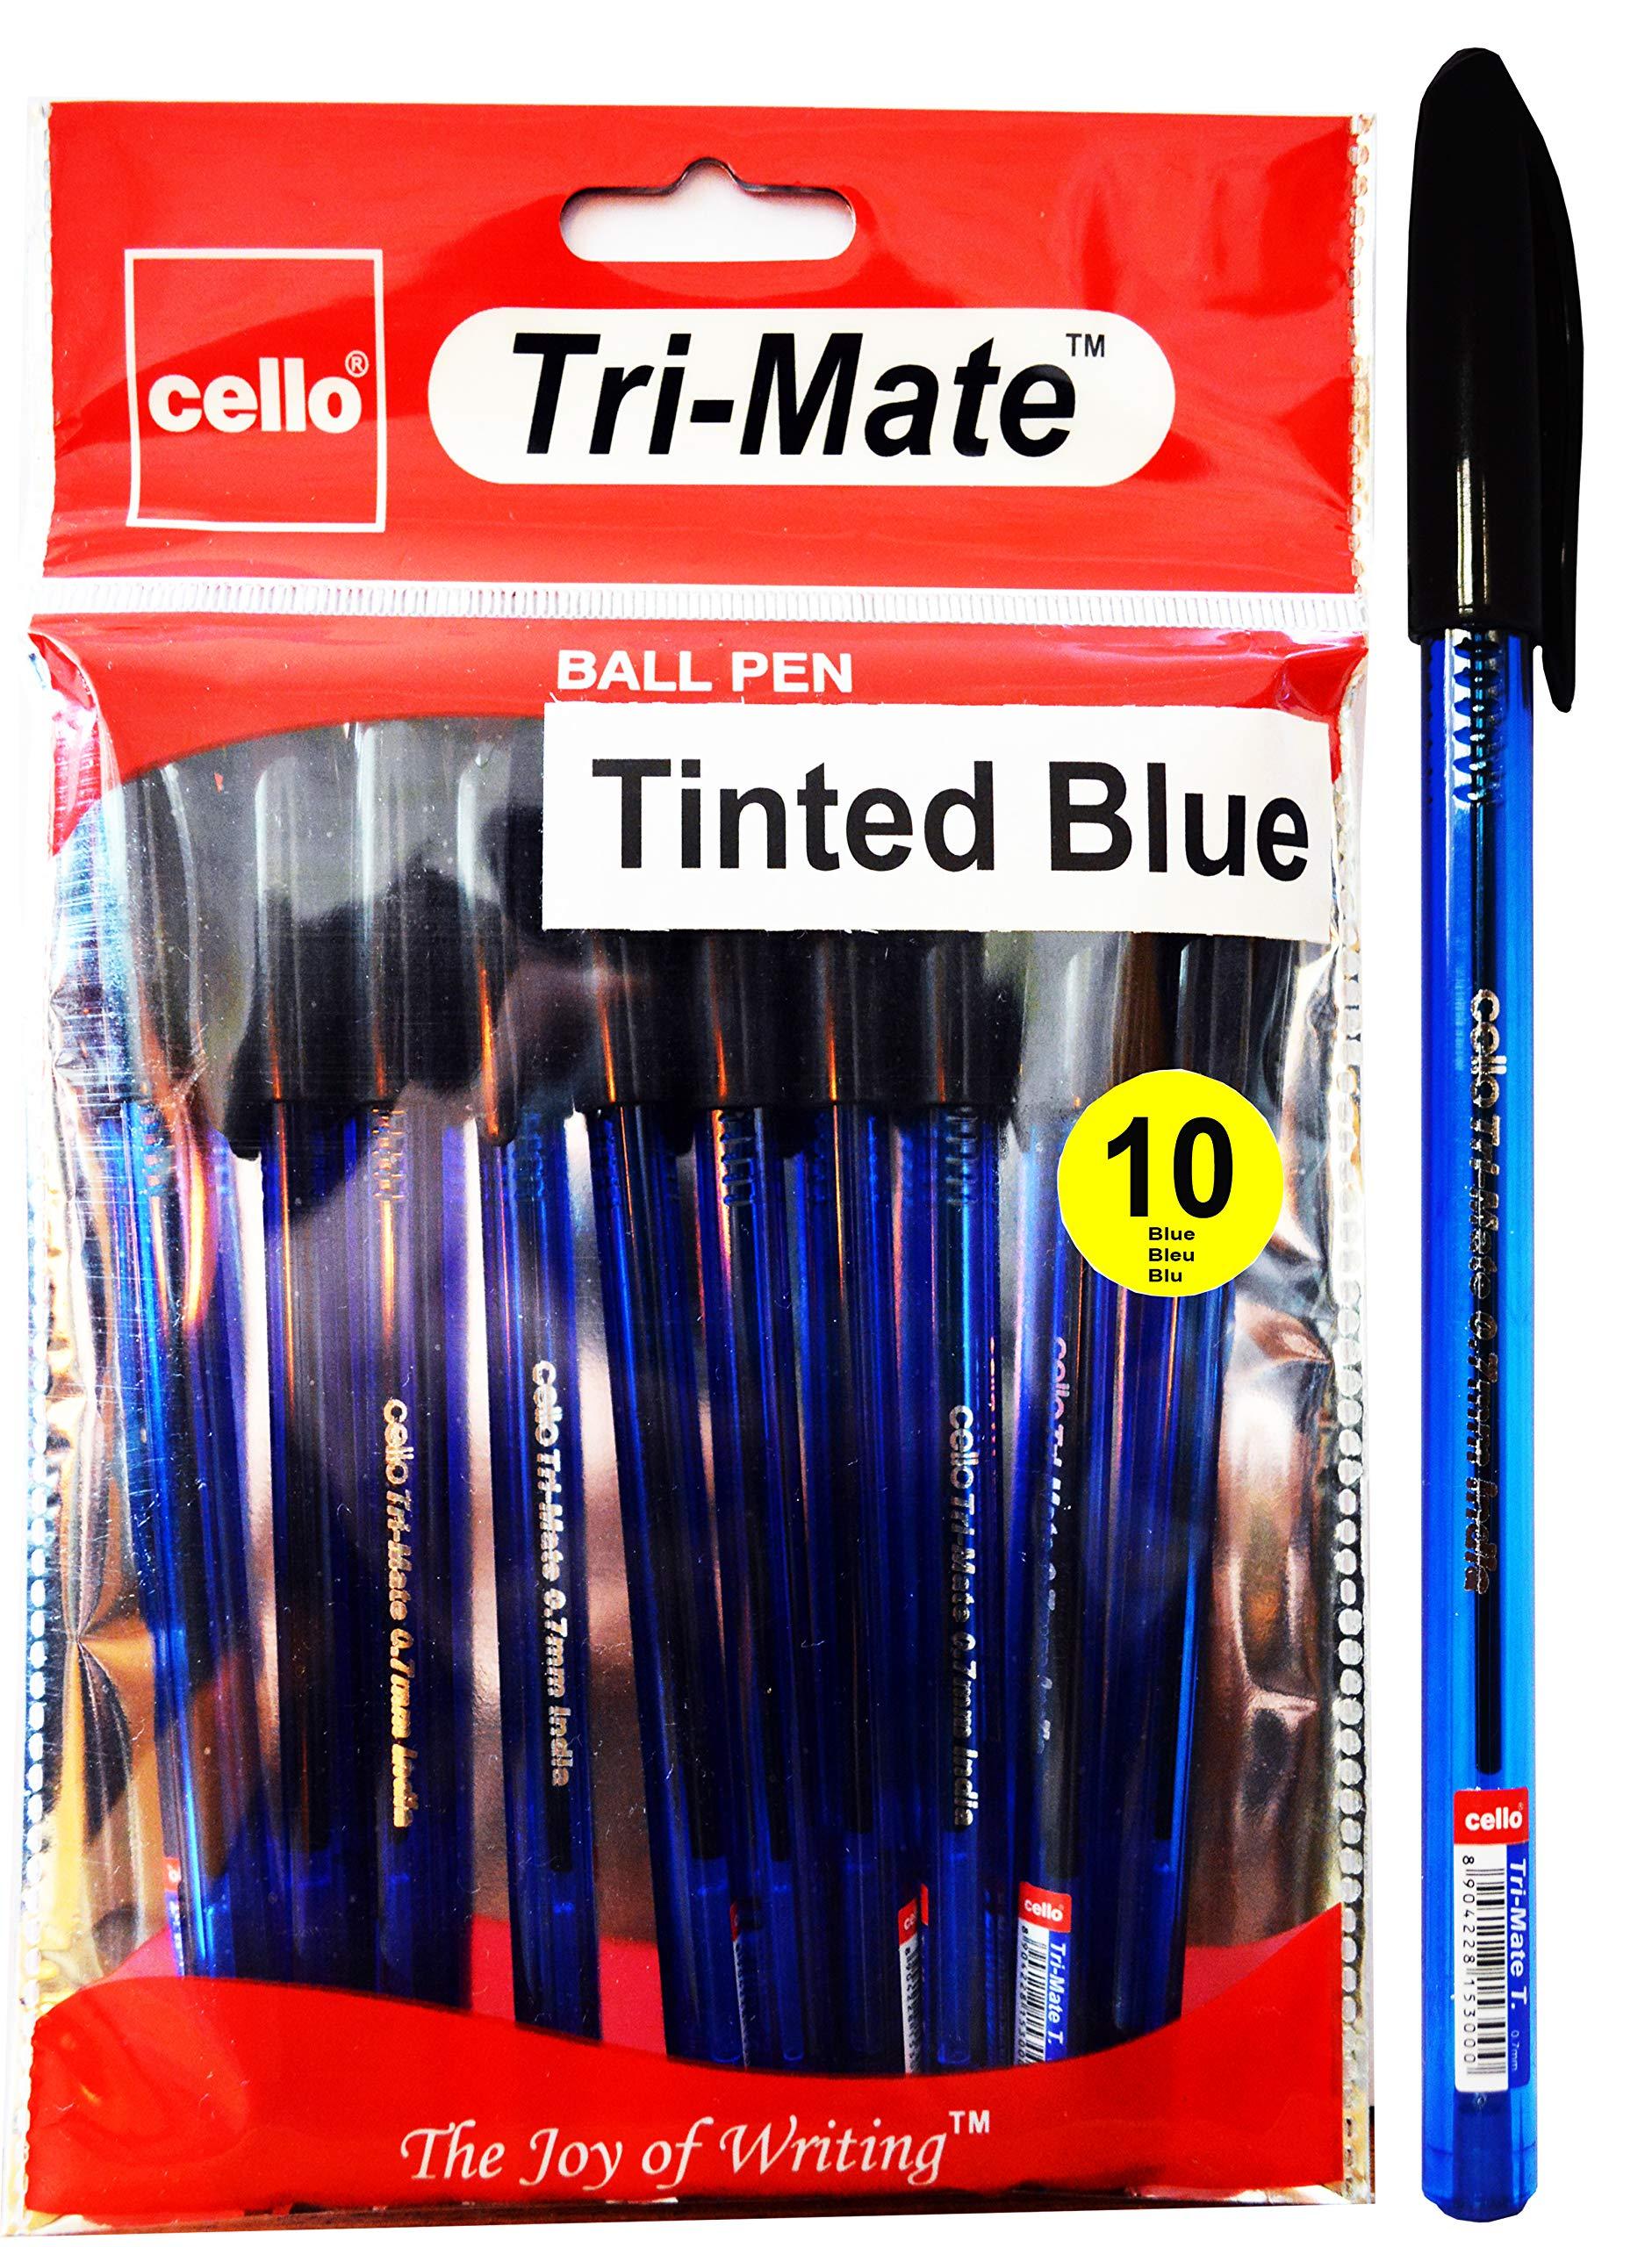 BIC violonchelo barril Tri-Mate Original Triangular Bolígrafo Punto Fino Negro Blu